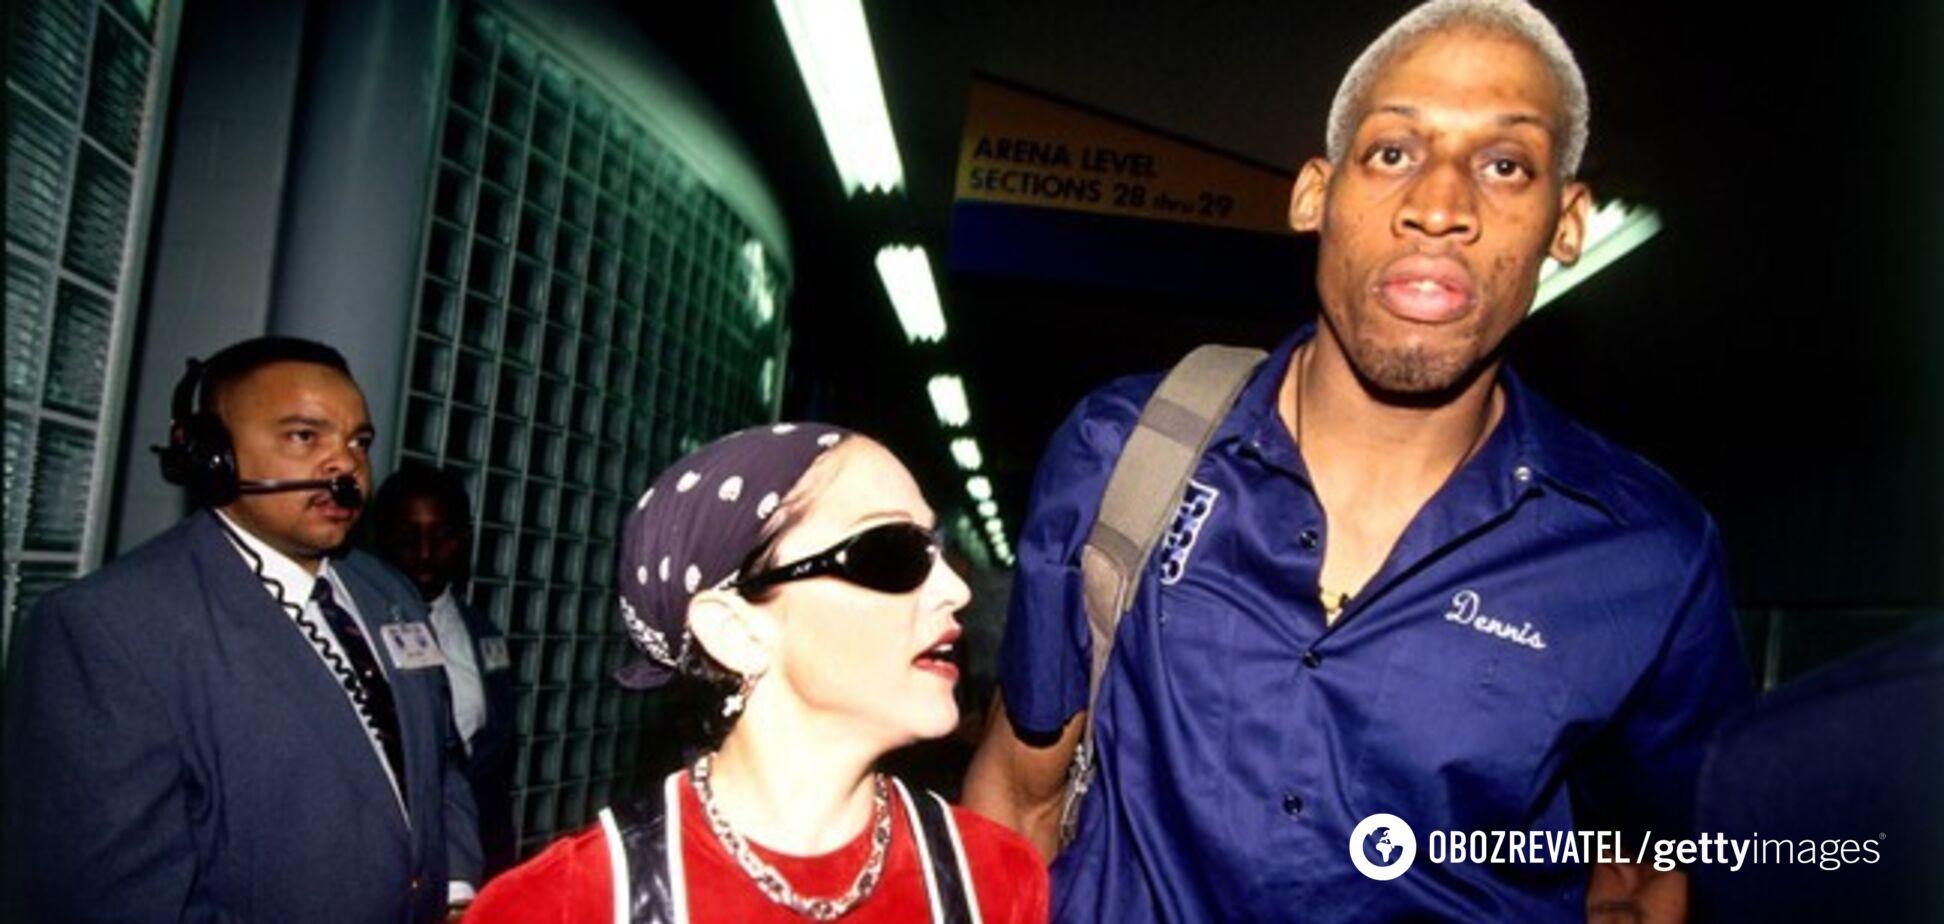 Секс за $20 млн: легенда НБА раскрыл подробности романа с Мадонной